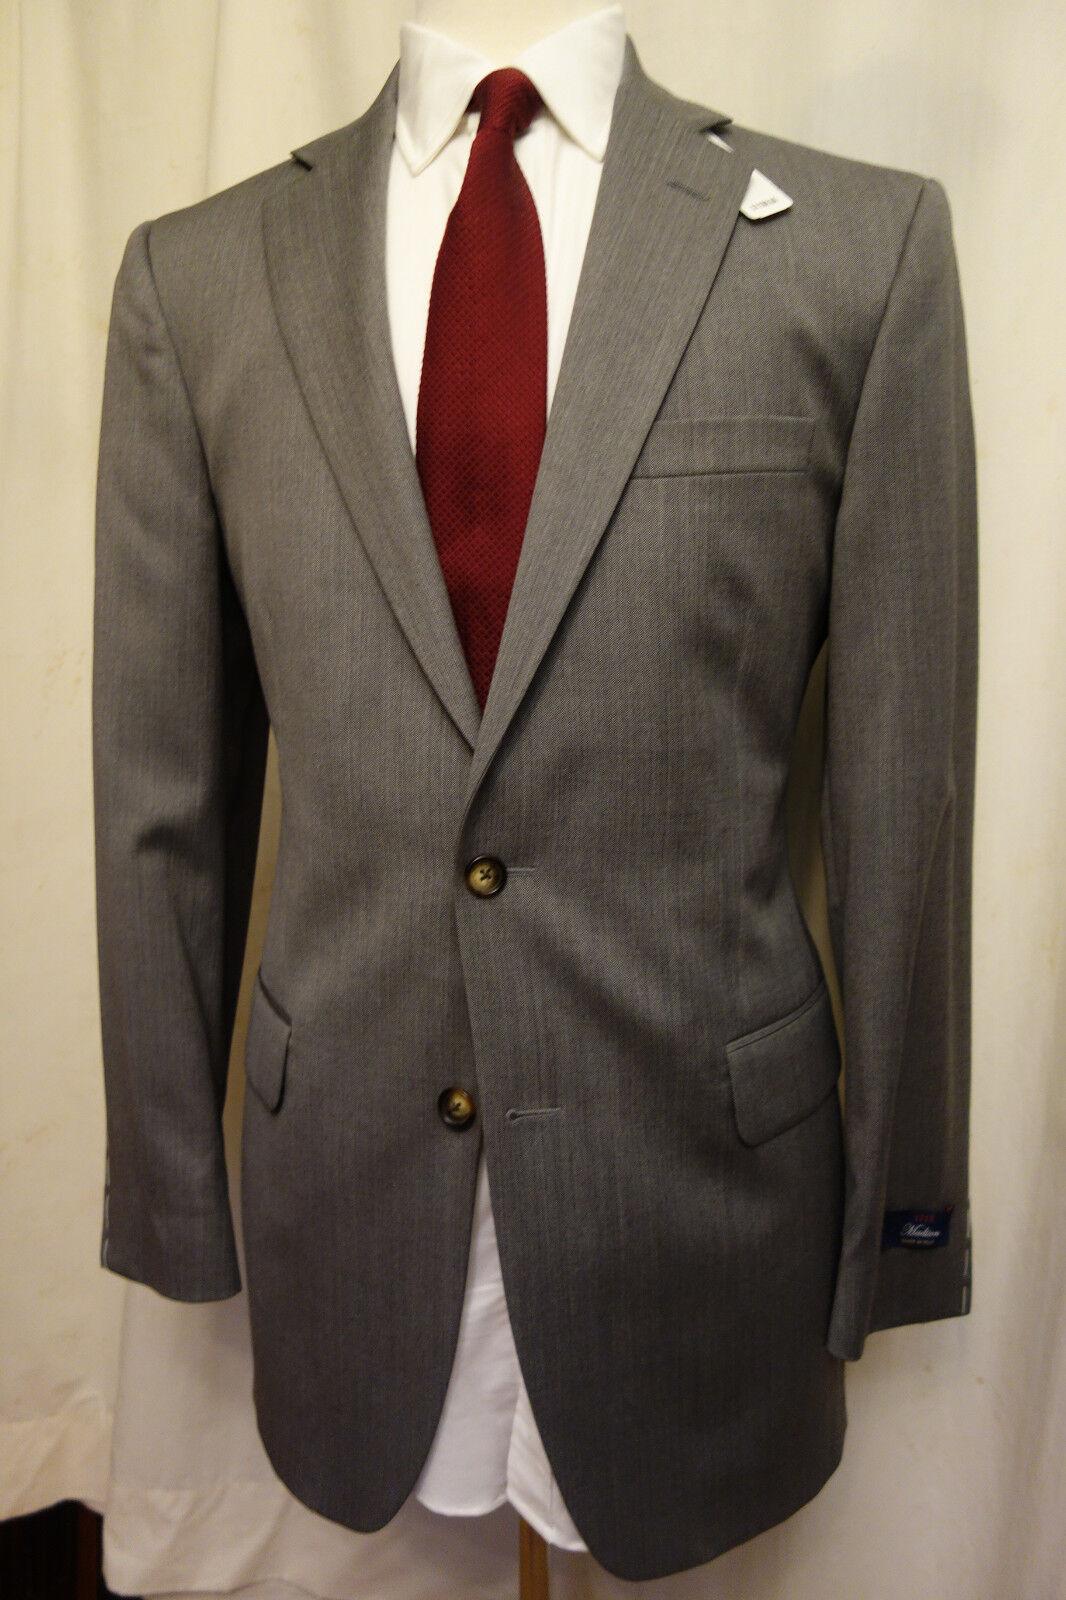 NWT Brooks Brothers 1818 Madison grau Drago Wool Suit 39L  Retail 1198